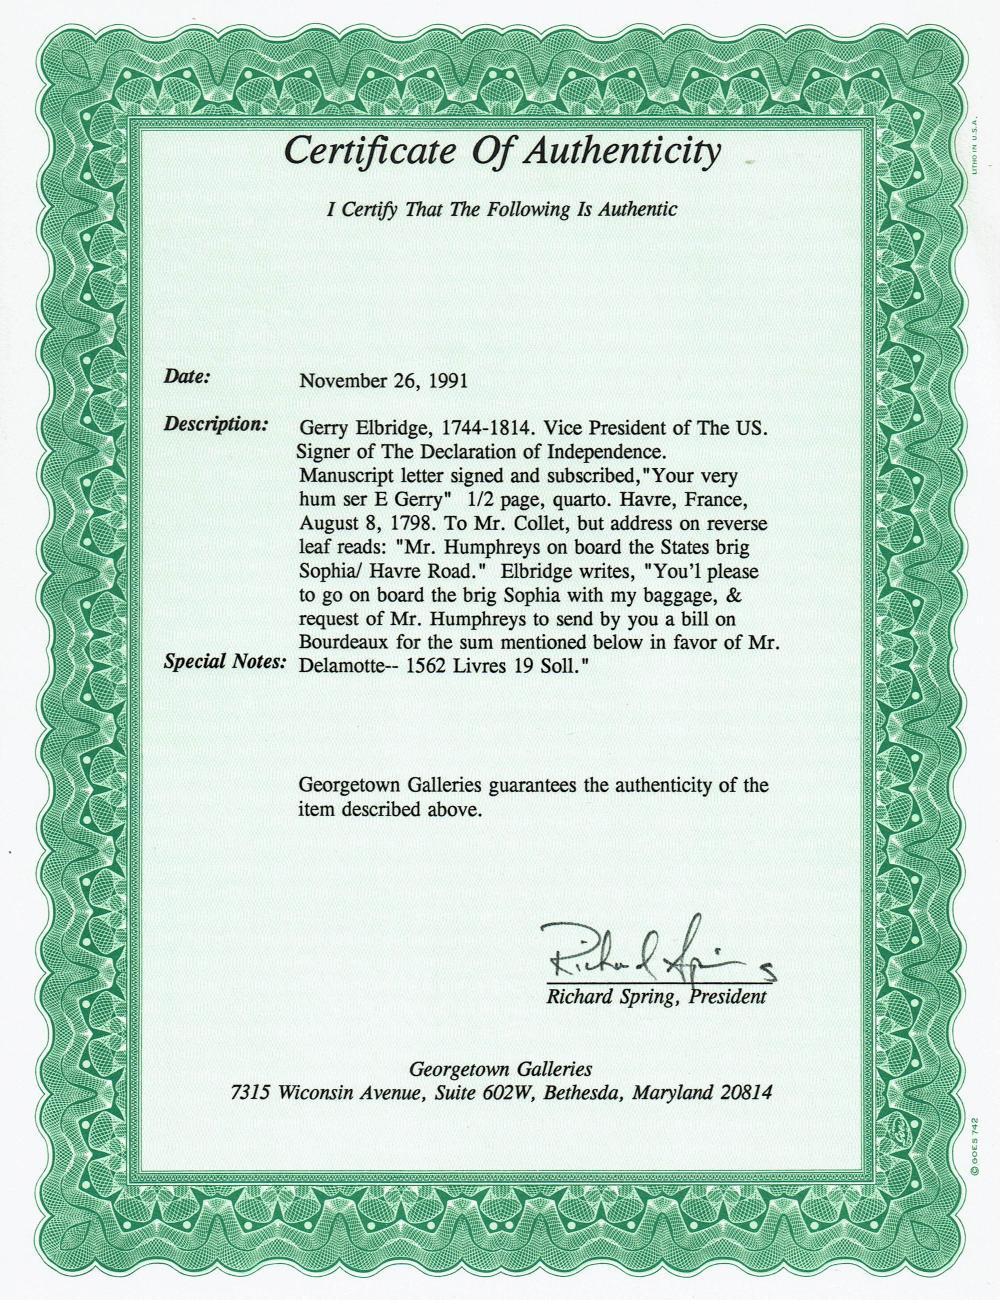 E. Gerry Signer of Declaration of Independence Impressively Displayed & Certified Letter Signed